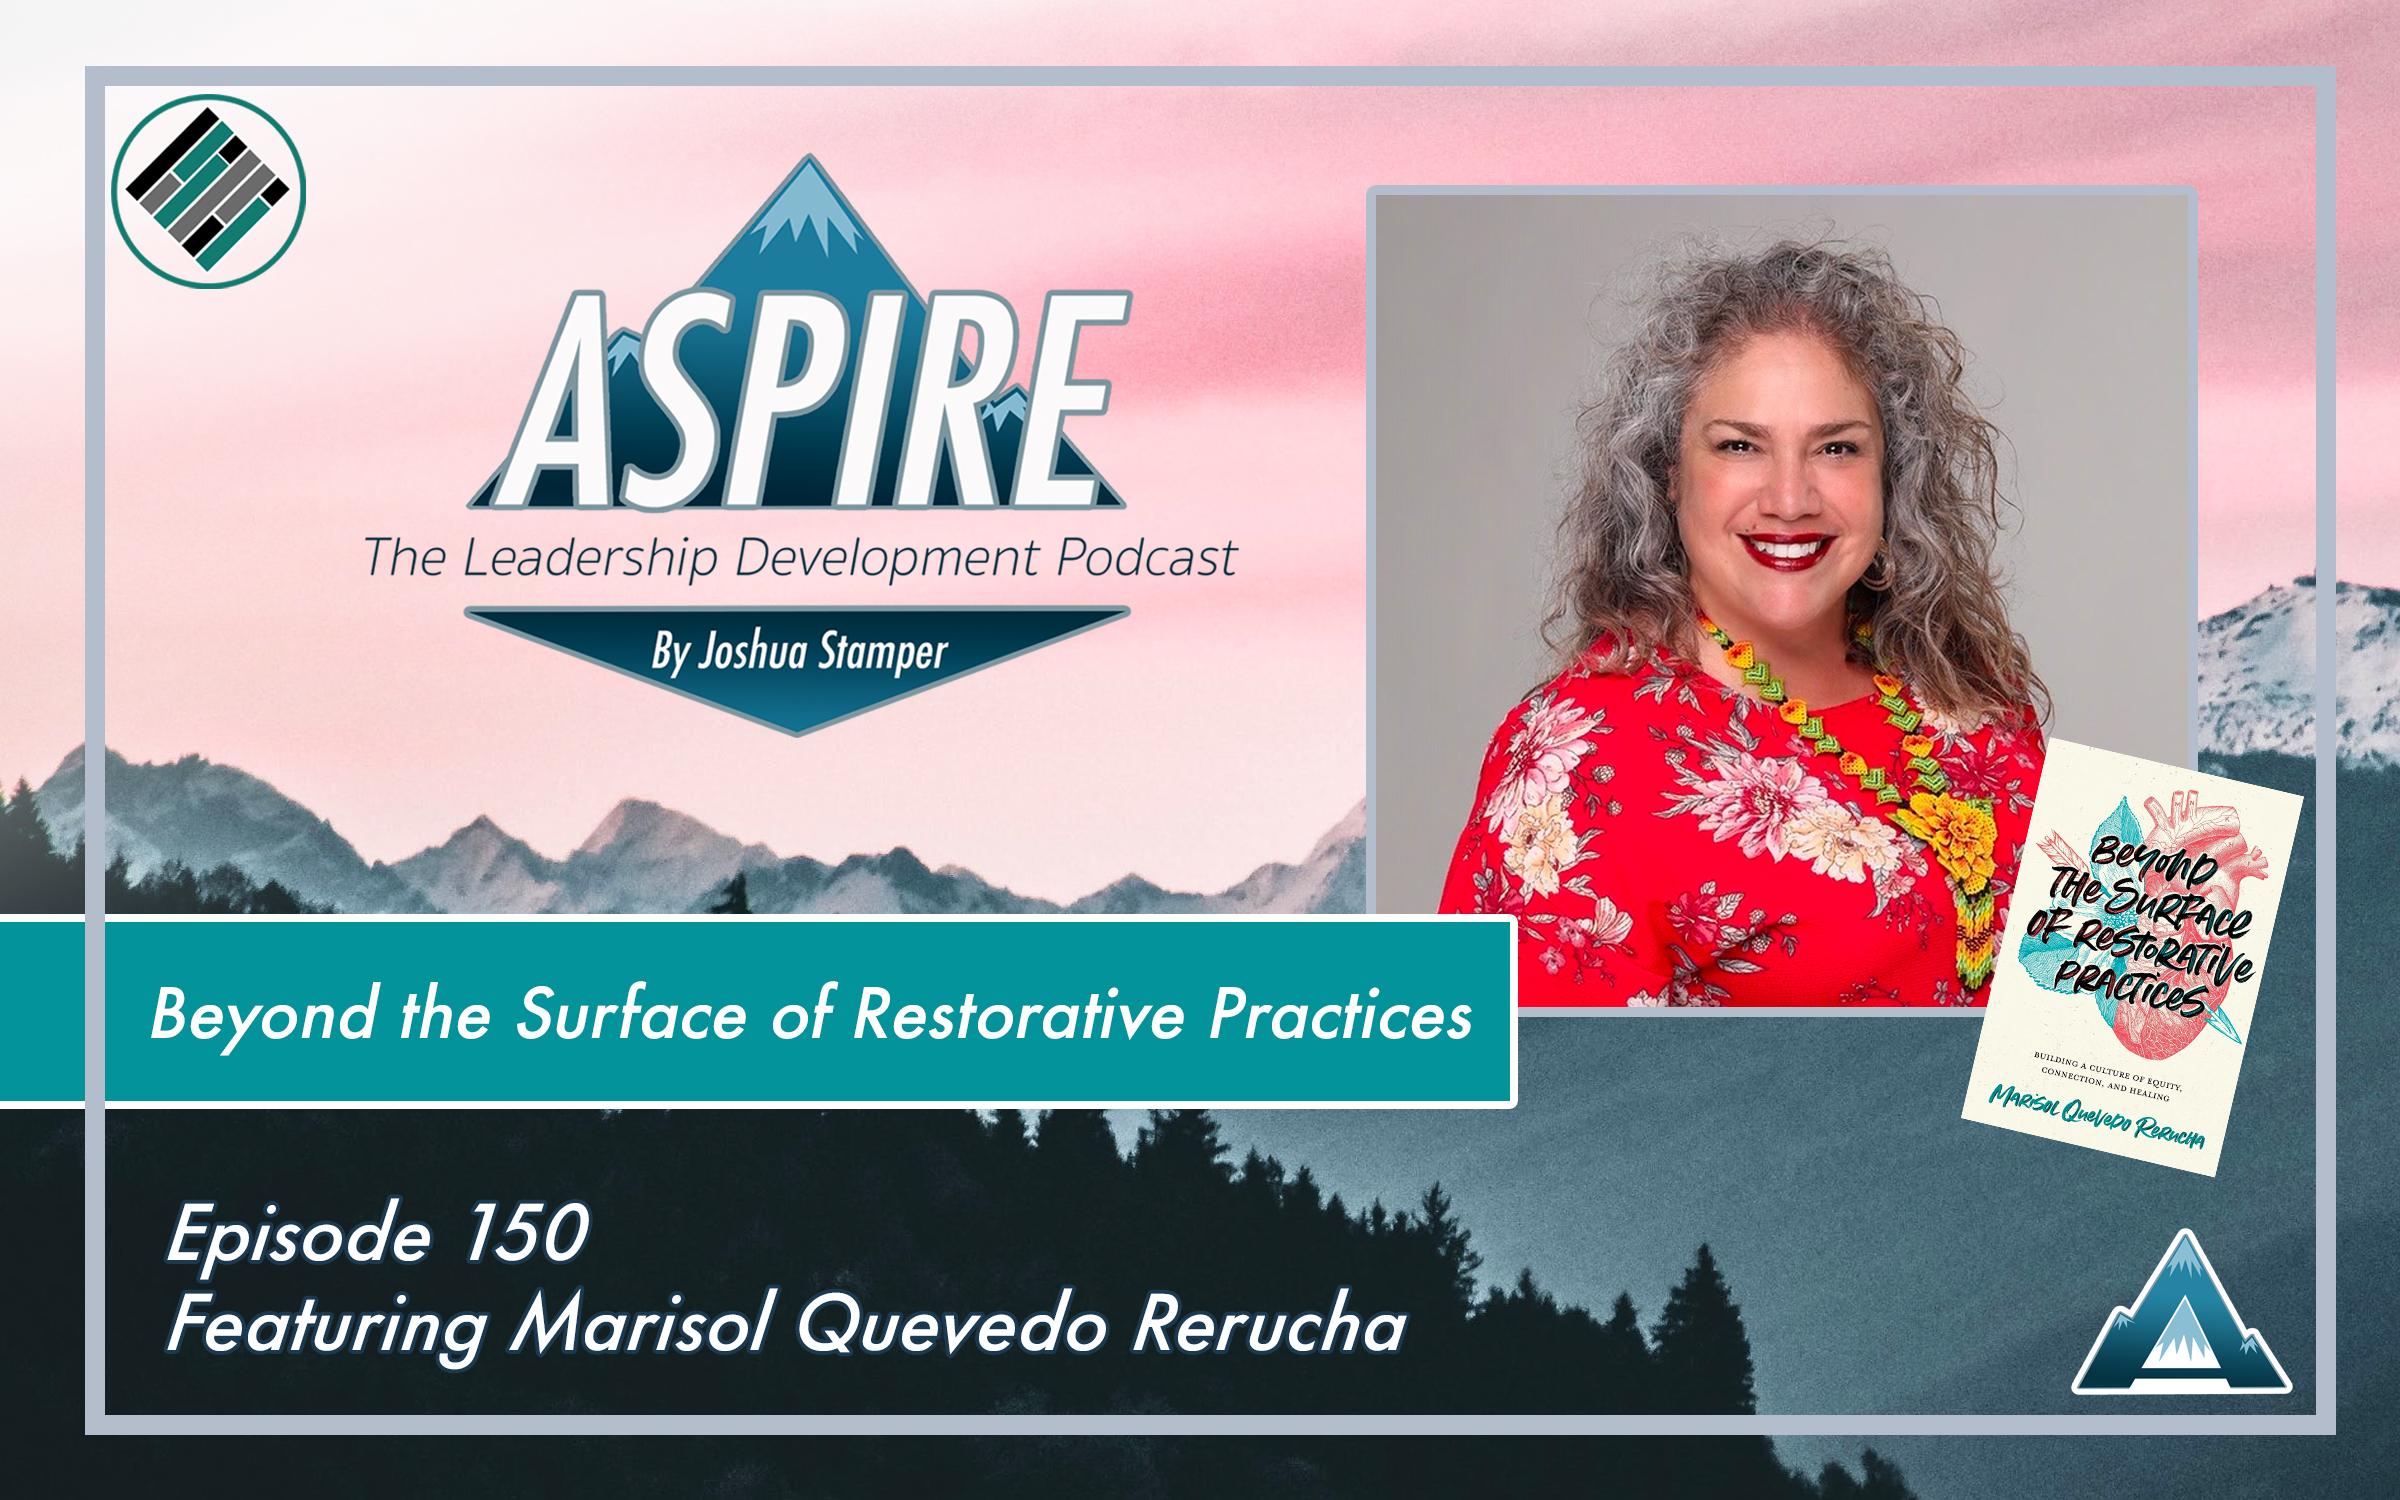 Joshua Stamper, Beyond the Surface of Restorative Practices, Marisol Quevedo Rerucha, Aspire: The Leadership Development Podcast, Teach Better